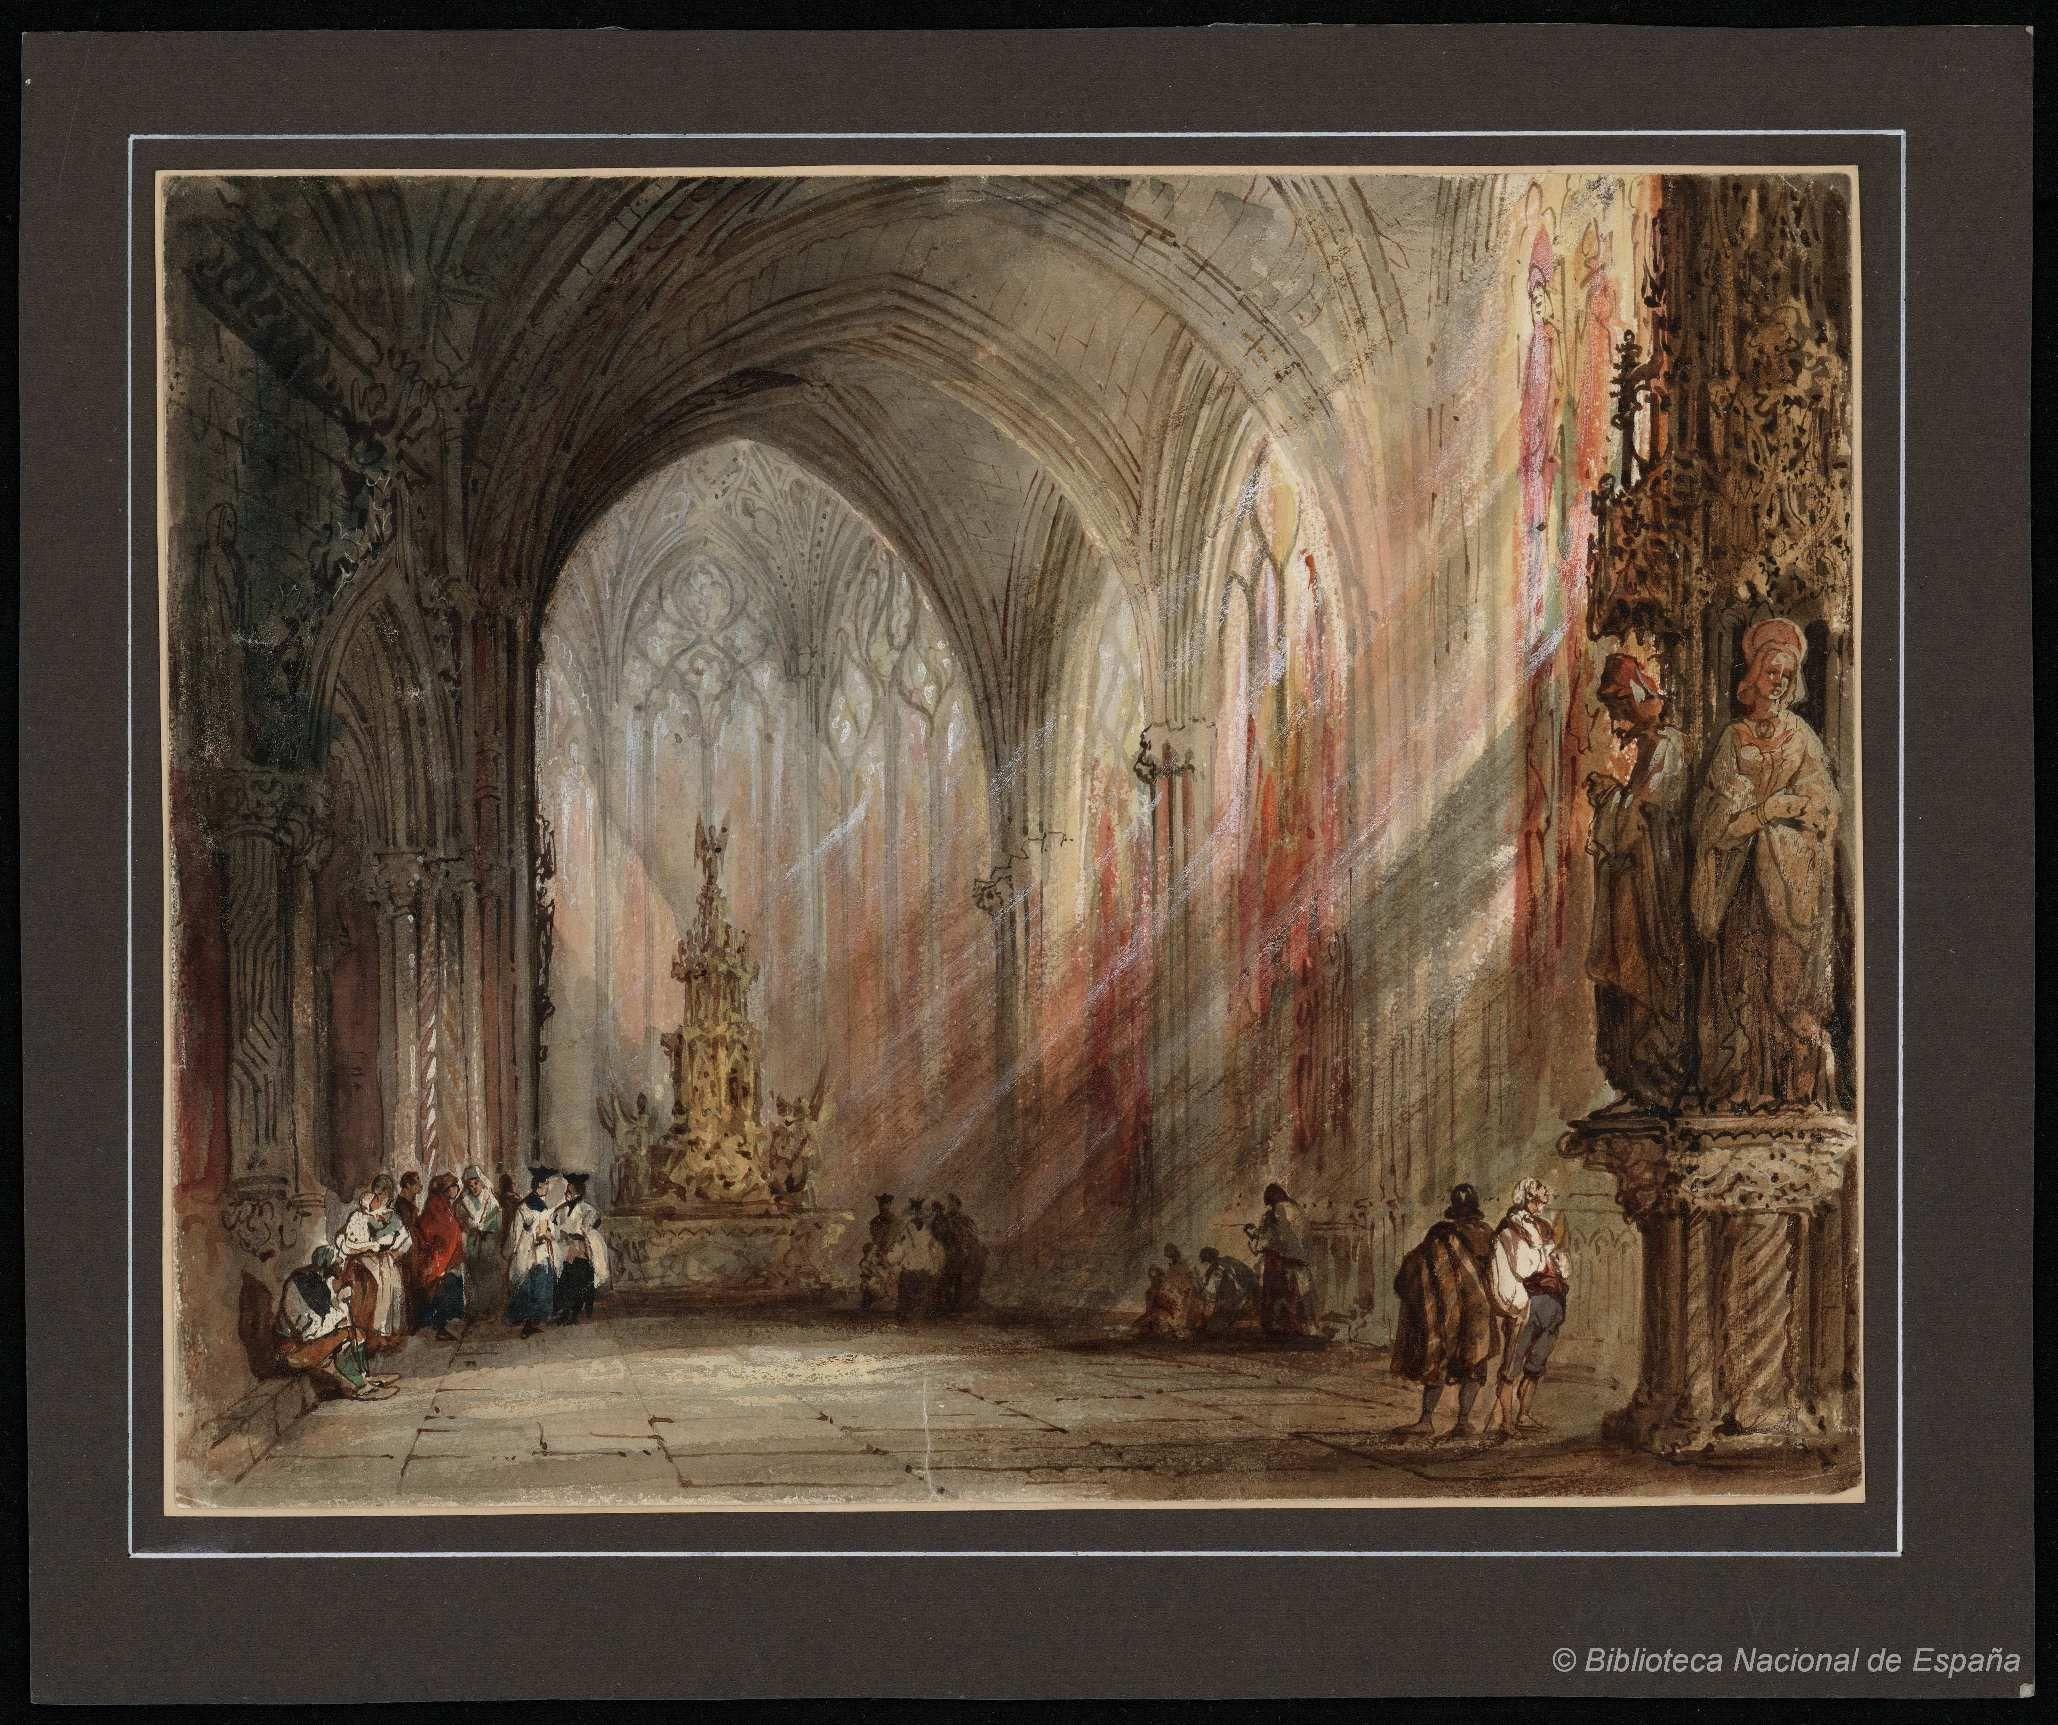 Nave de una iglesia gtica Prez Villaamil Jenaro 18071854